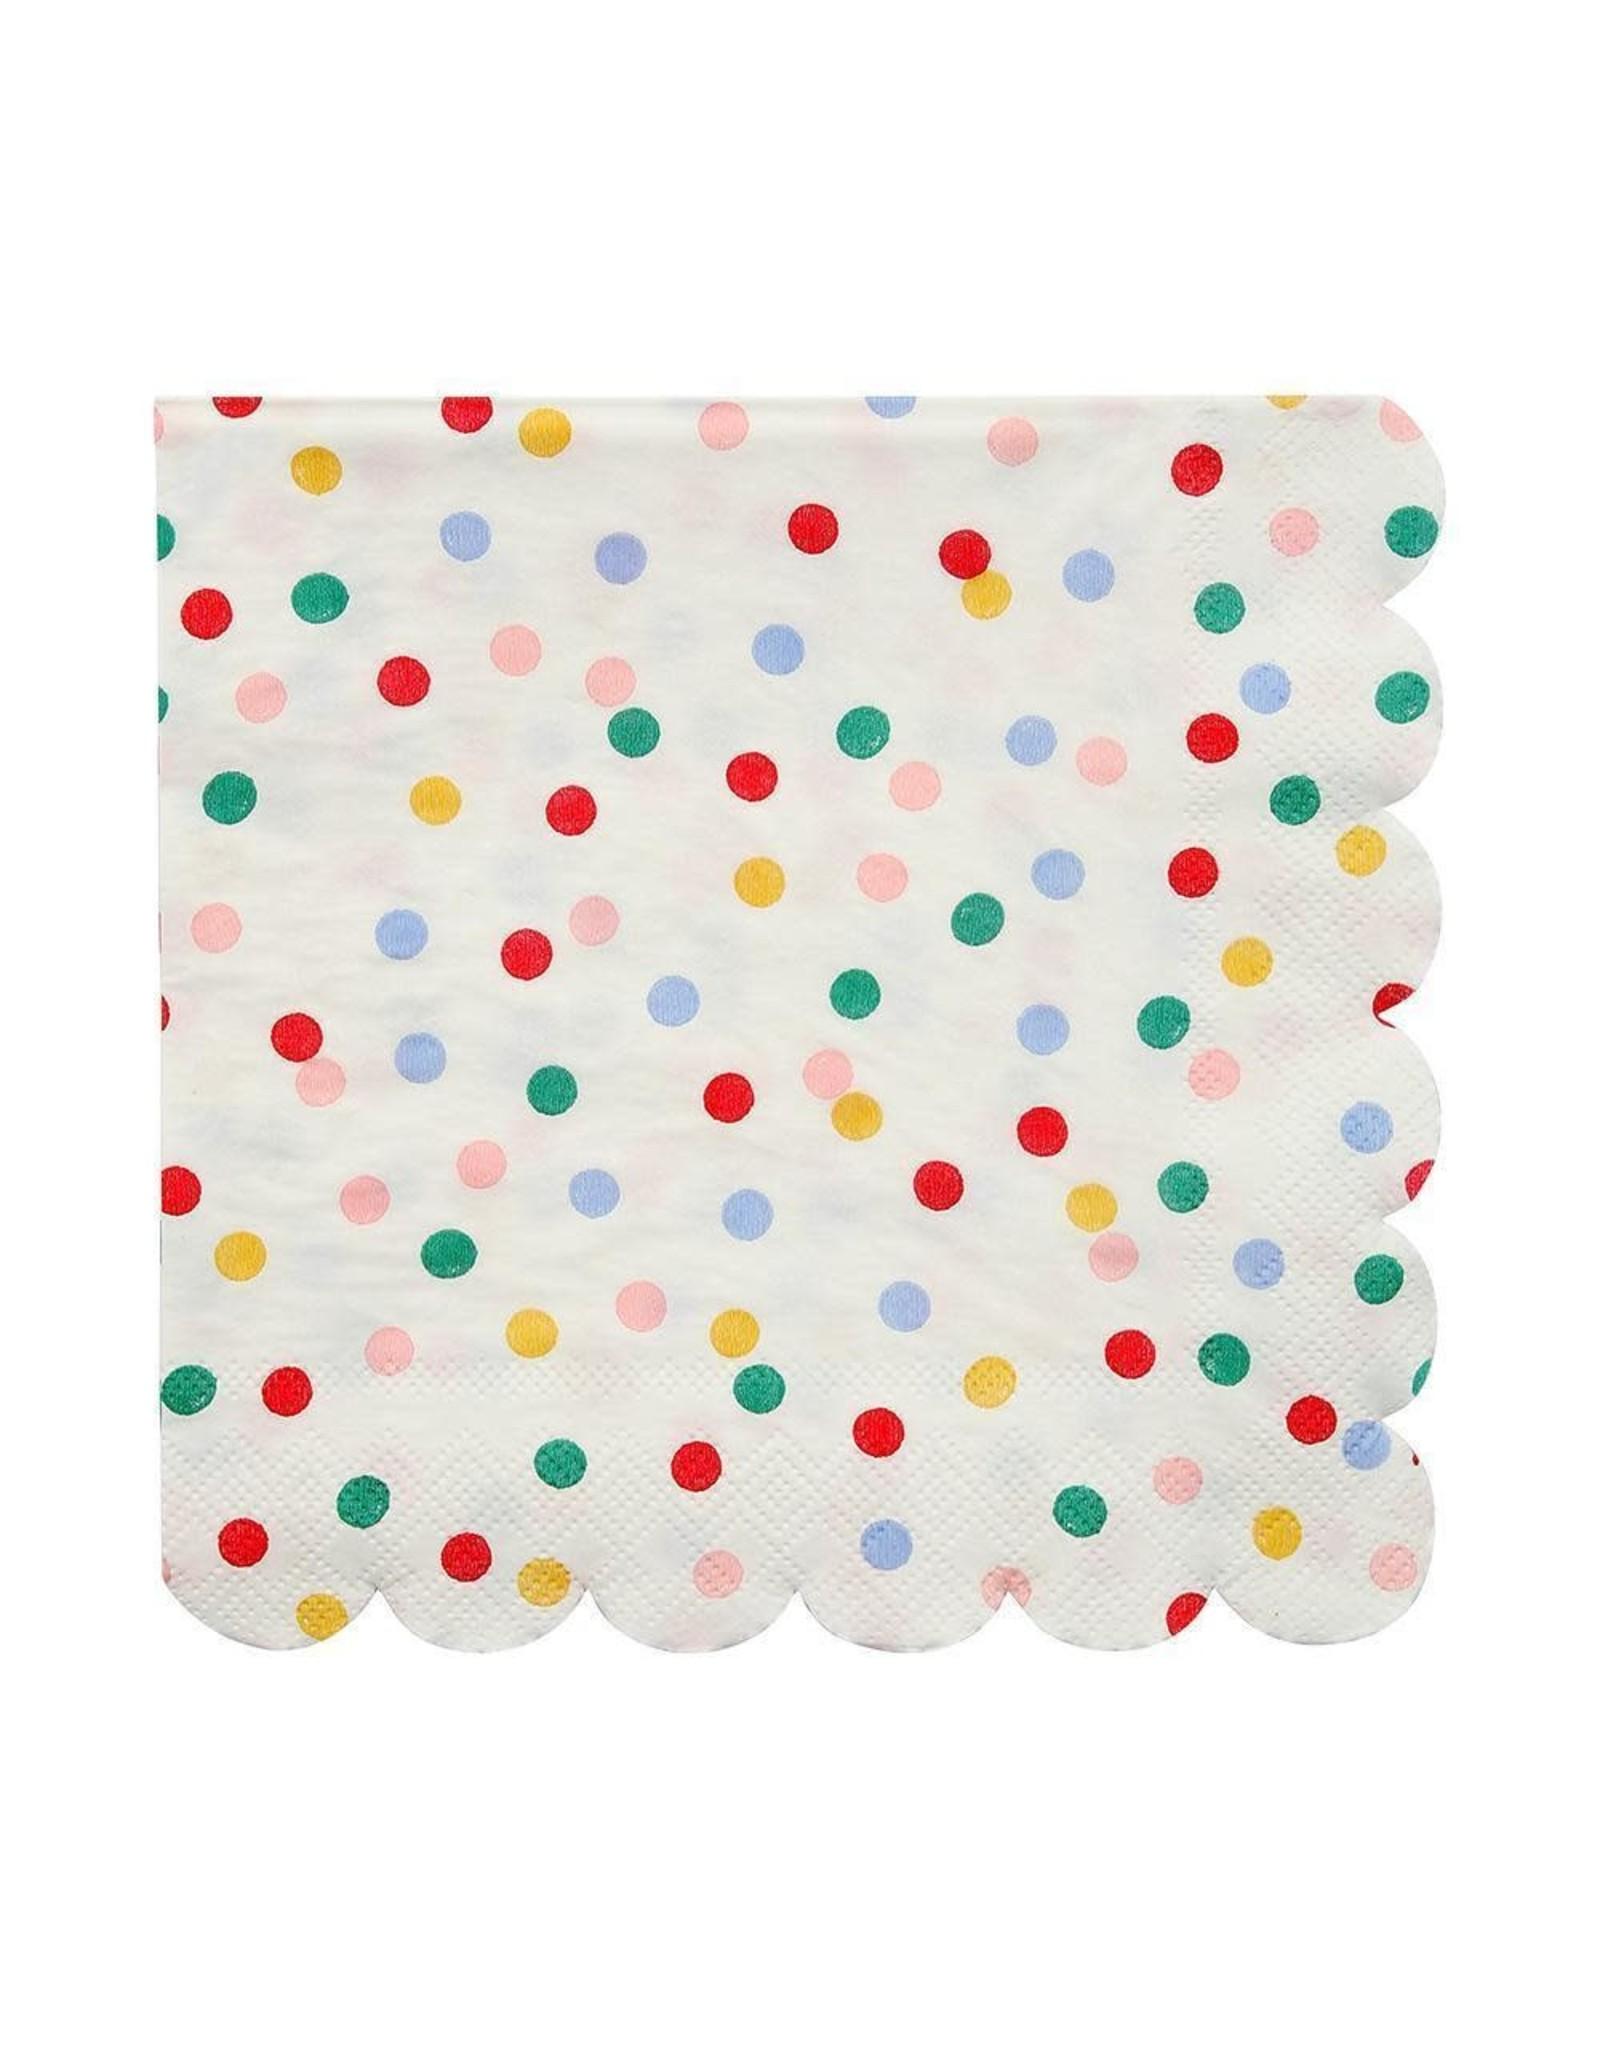 Meri Meri Serviettes | Confetti | 16st | 13 x 13cm